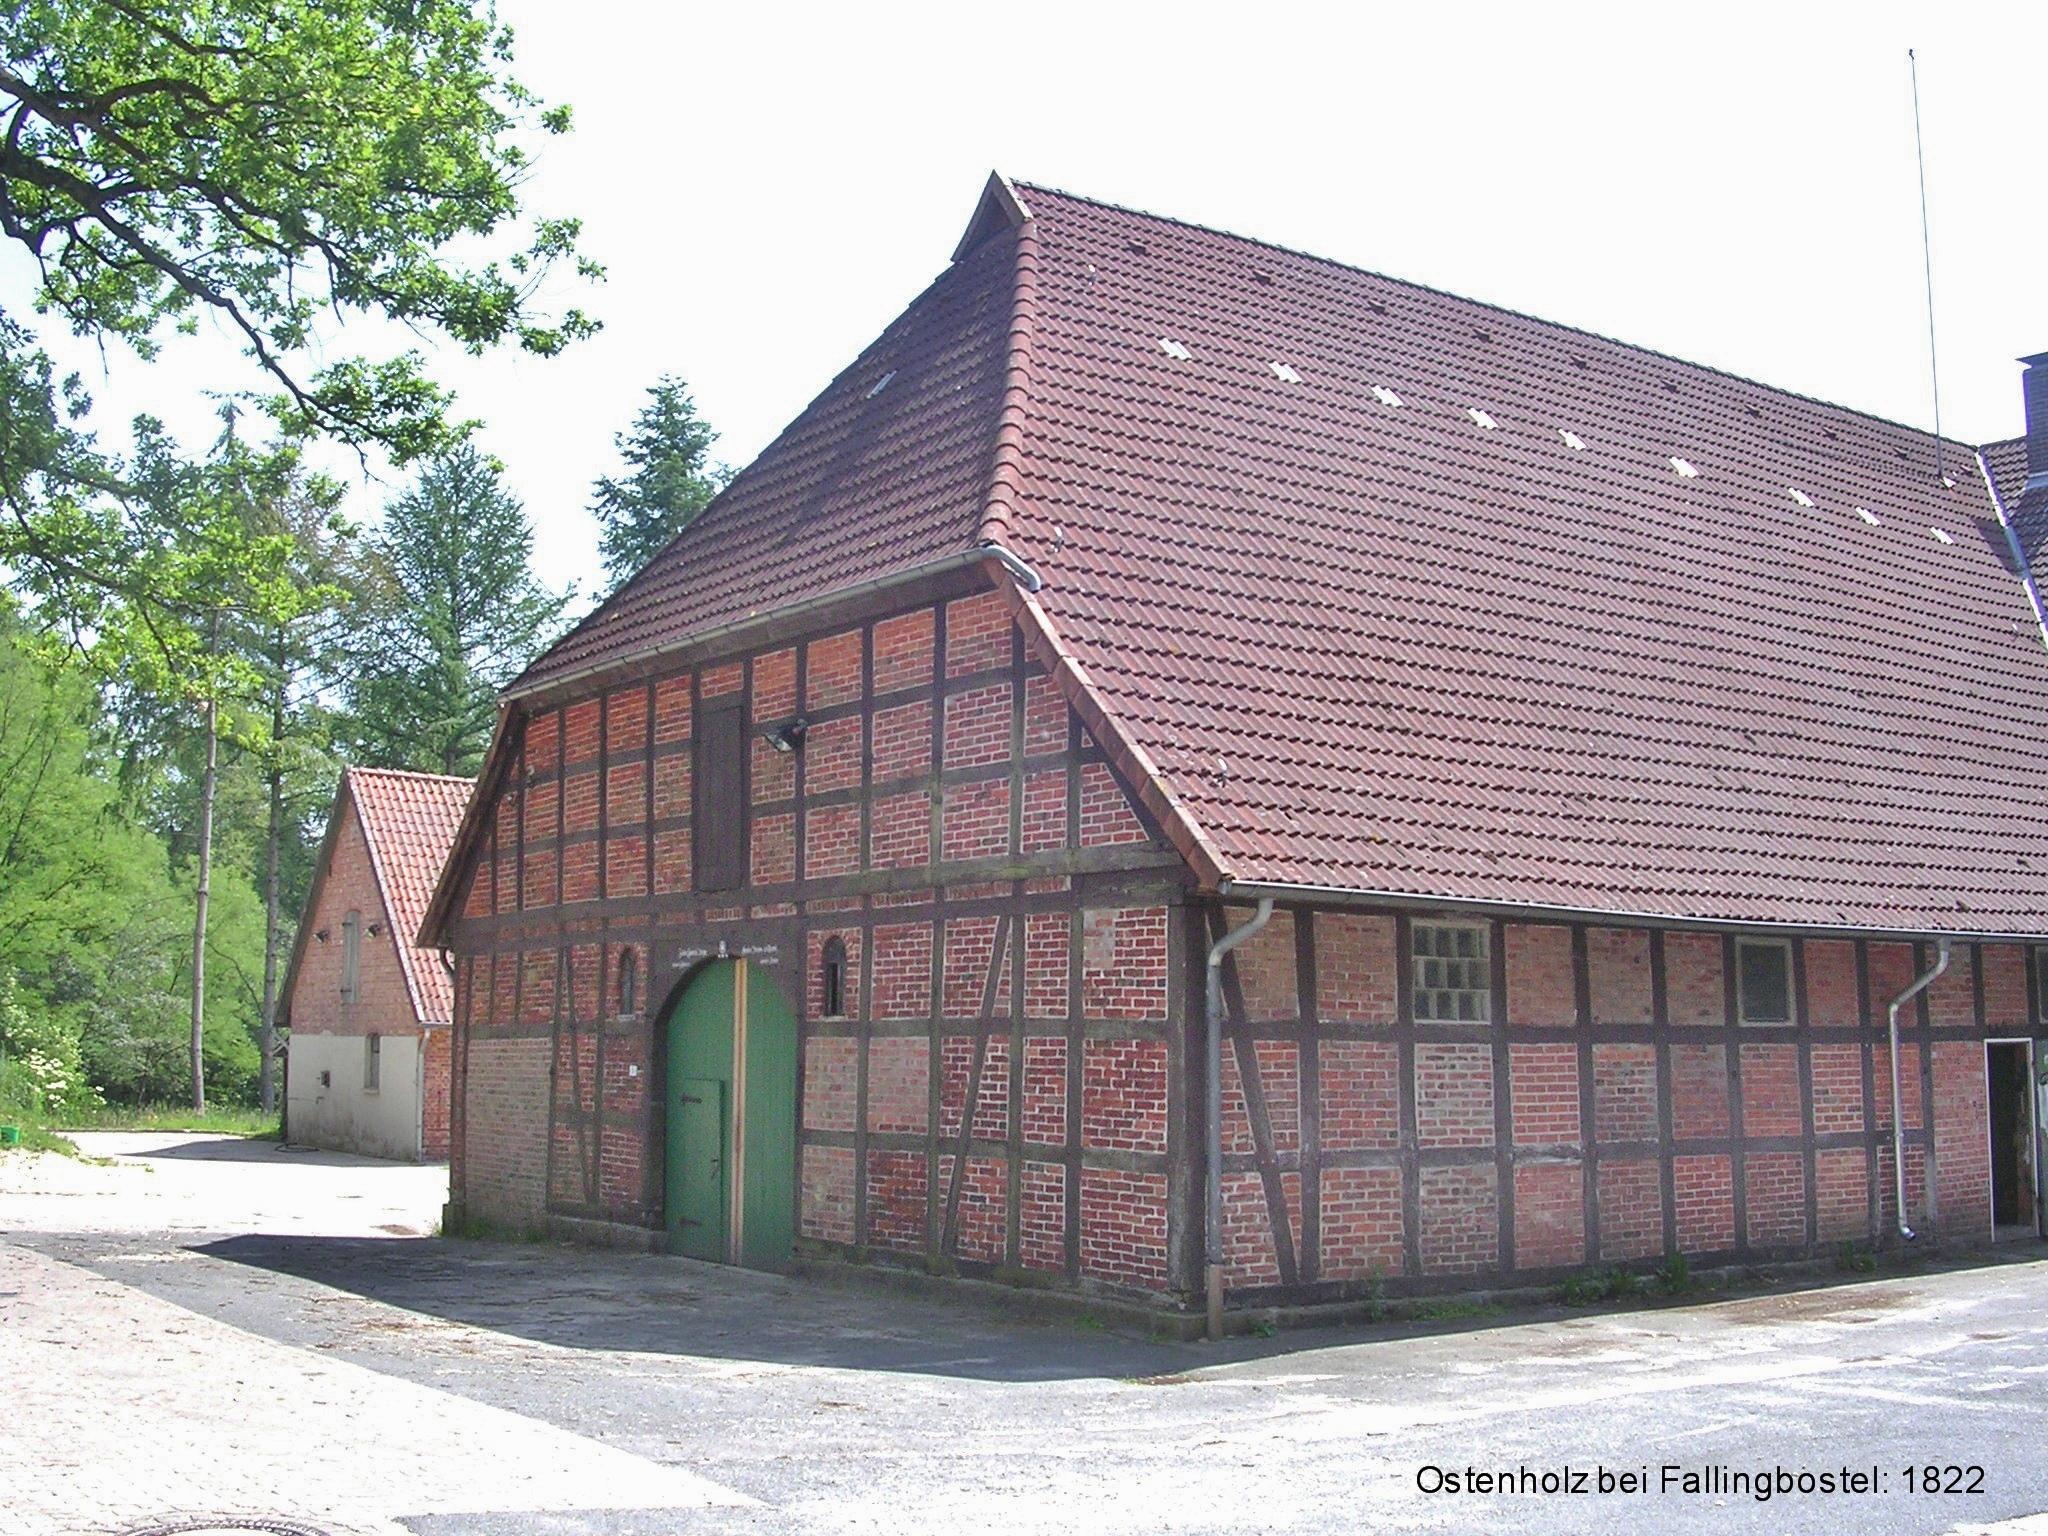 h-ostenholz-fal-1822-